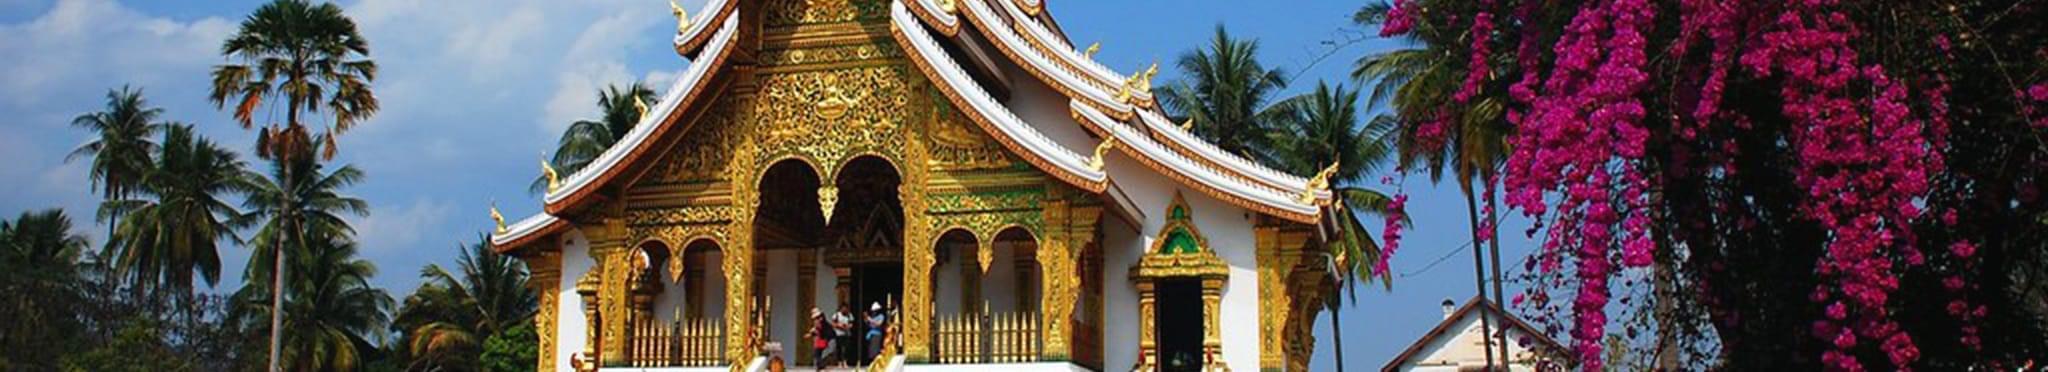 Город золотых храмов:<br>Луанг Прабанг, Ванг Вьенг, Вьентьян